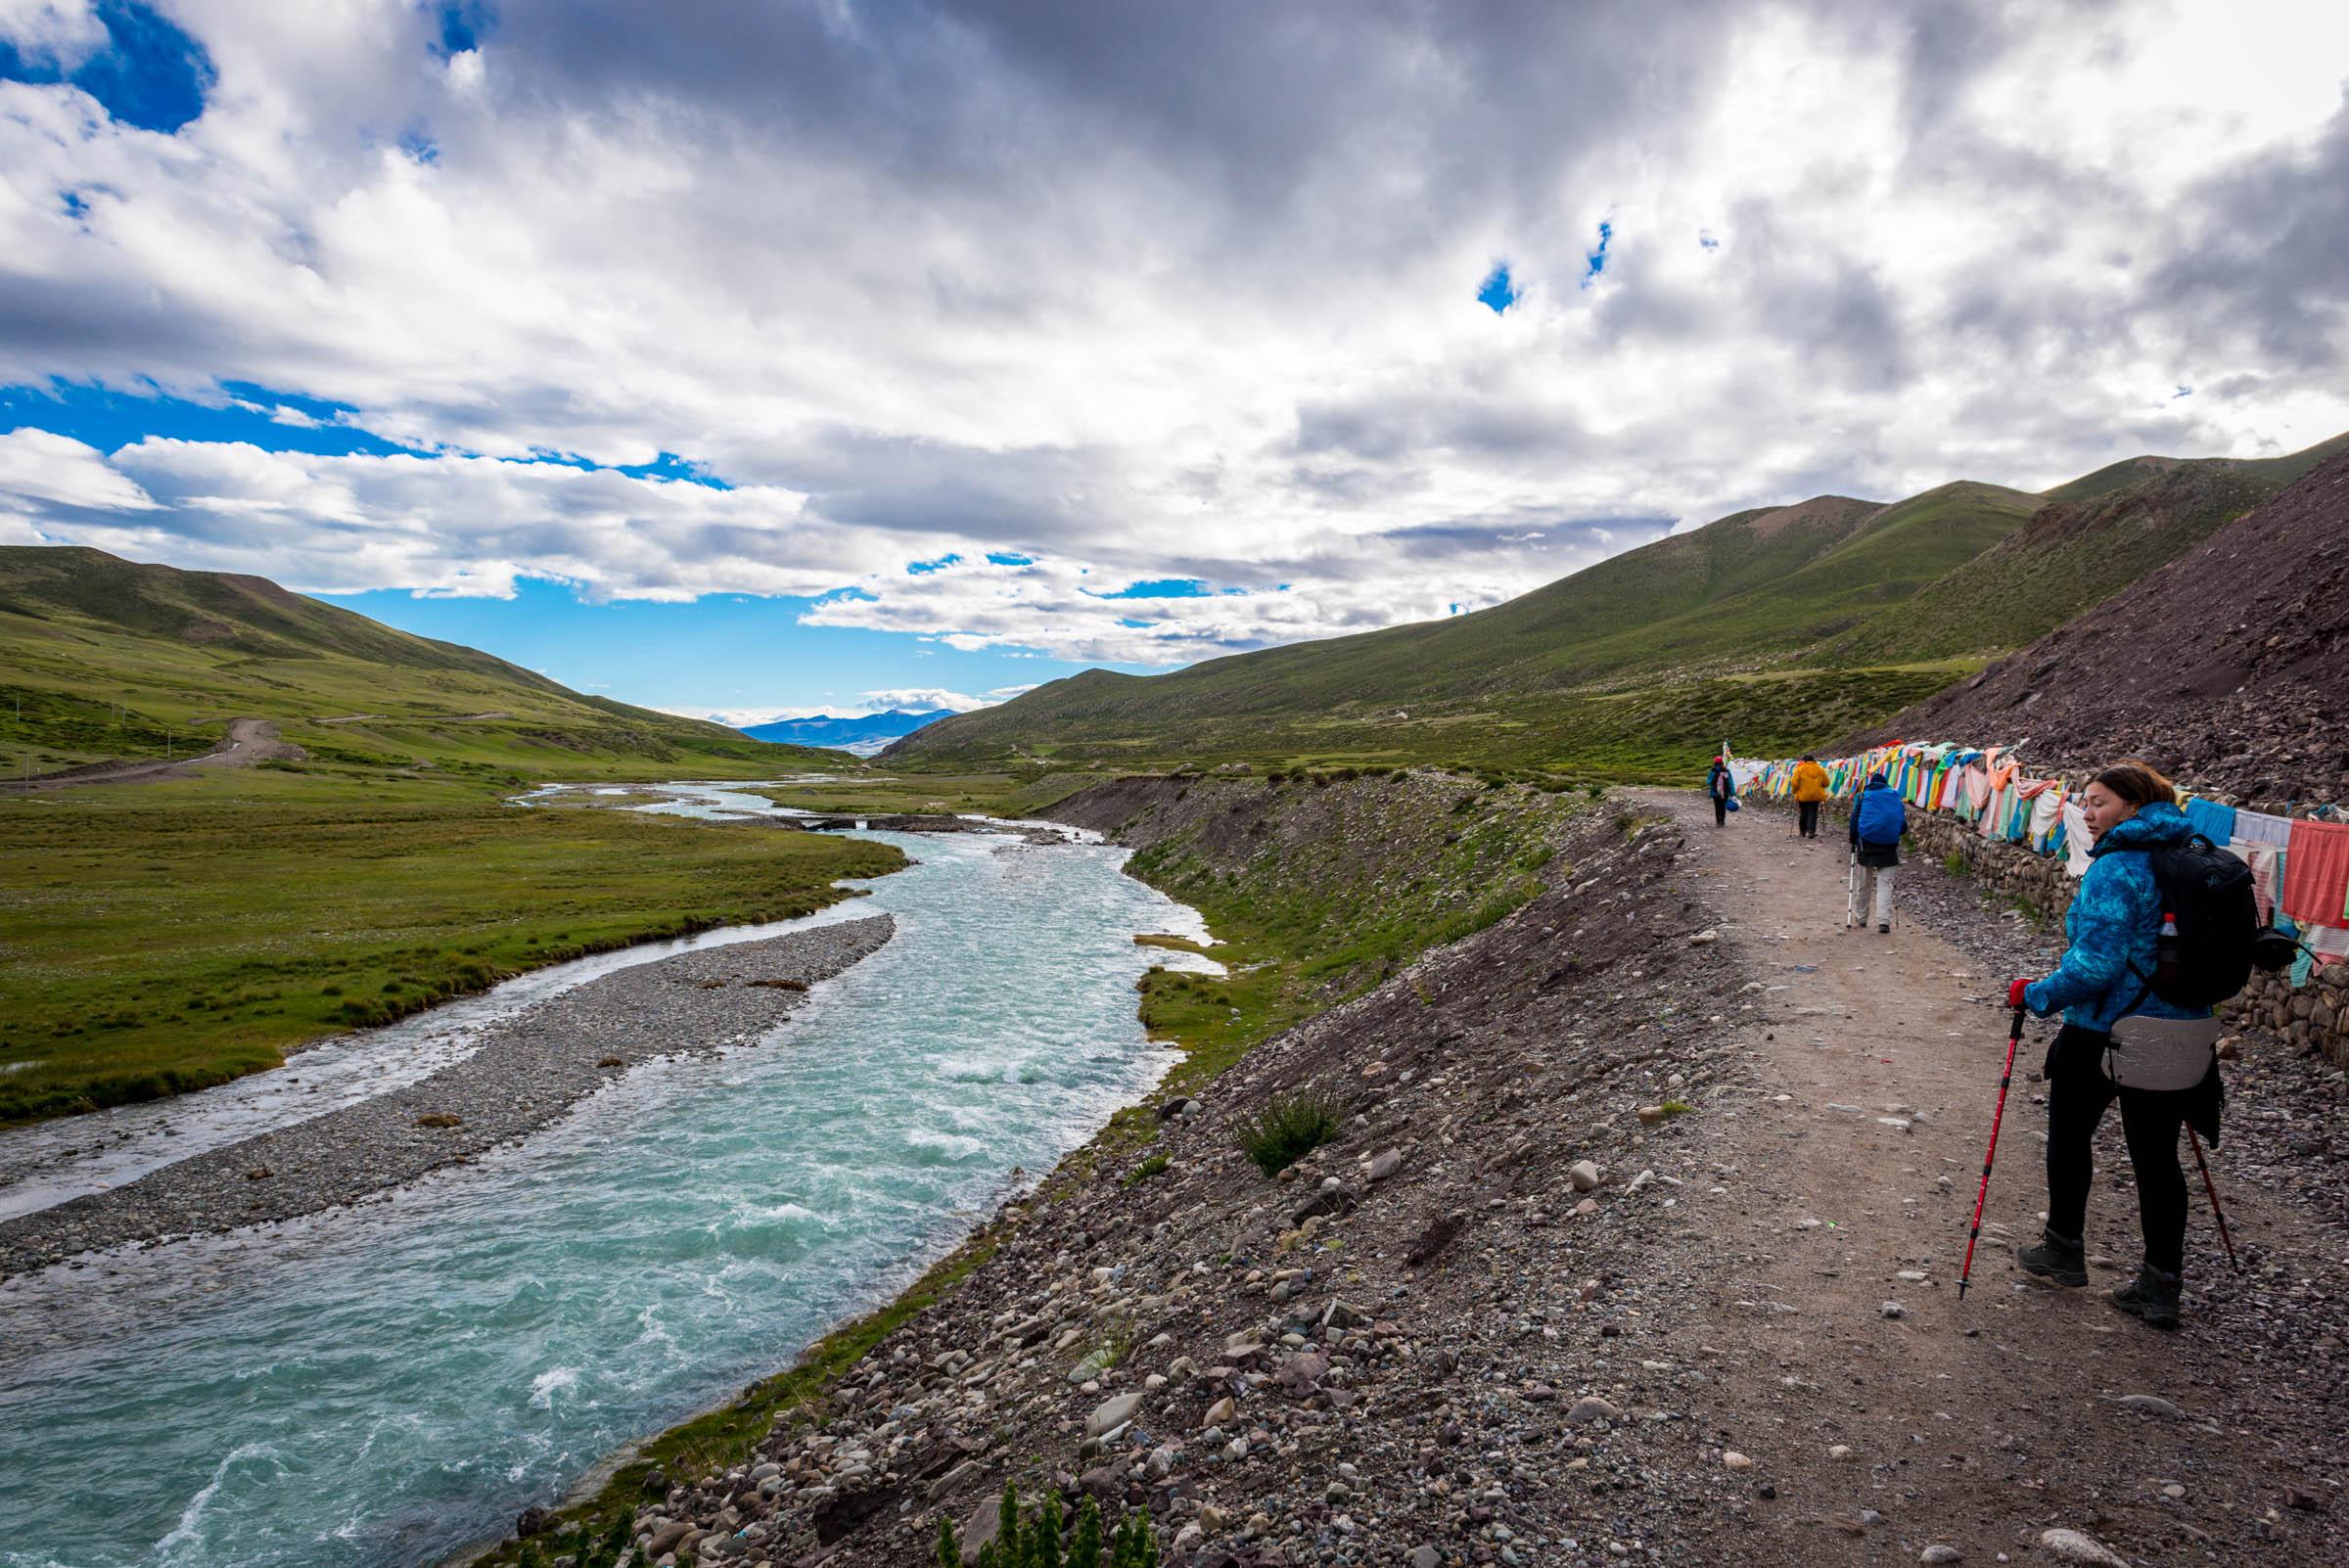 2018 Mt Kailash Kora Lhasa Everest And Mt Kailash